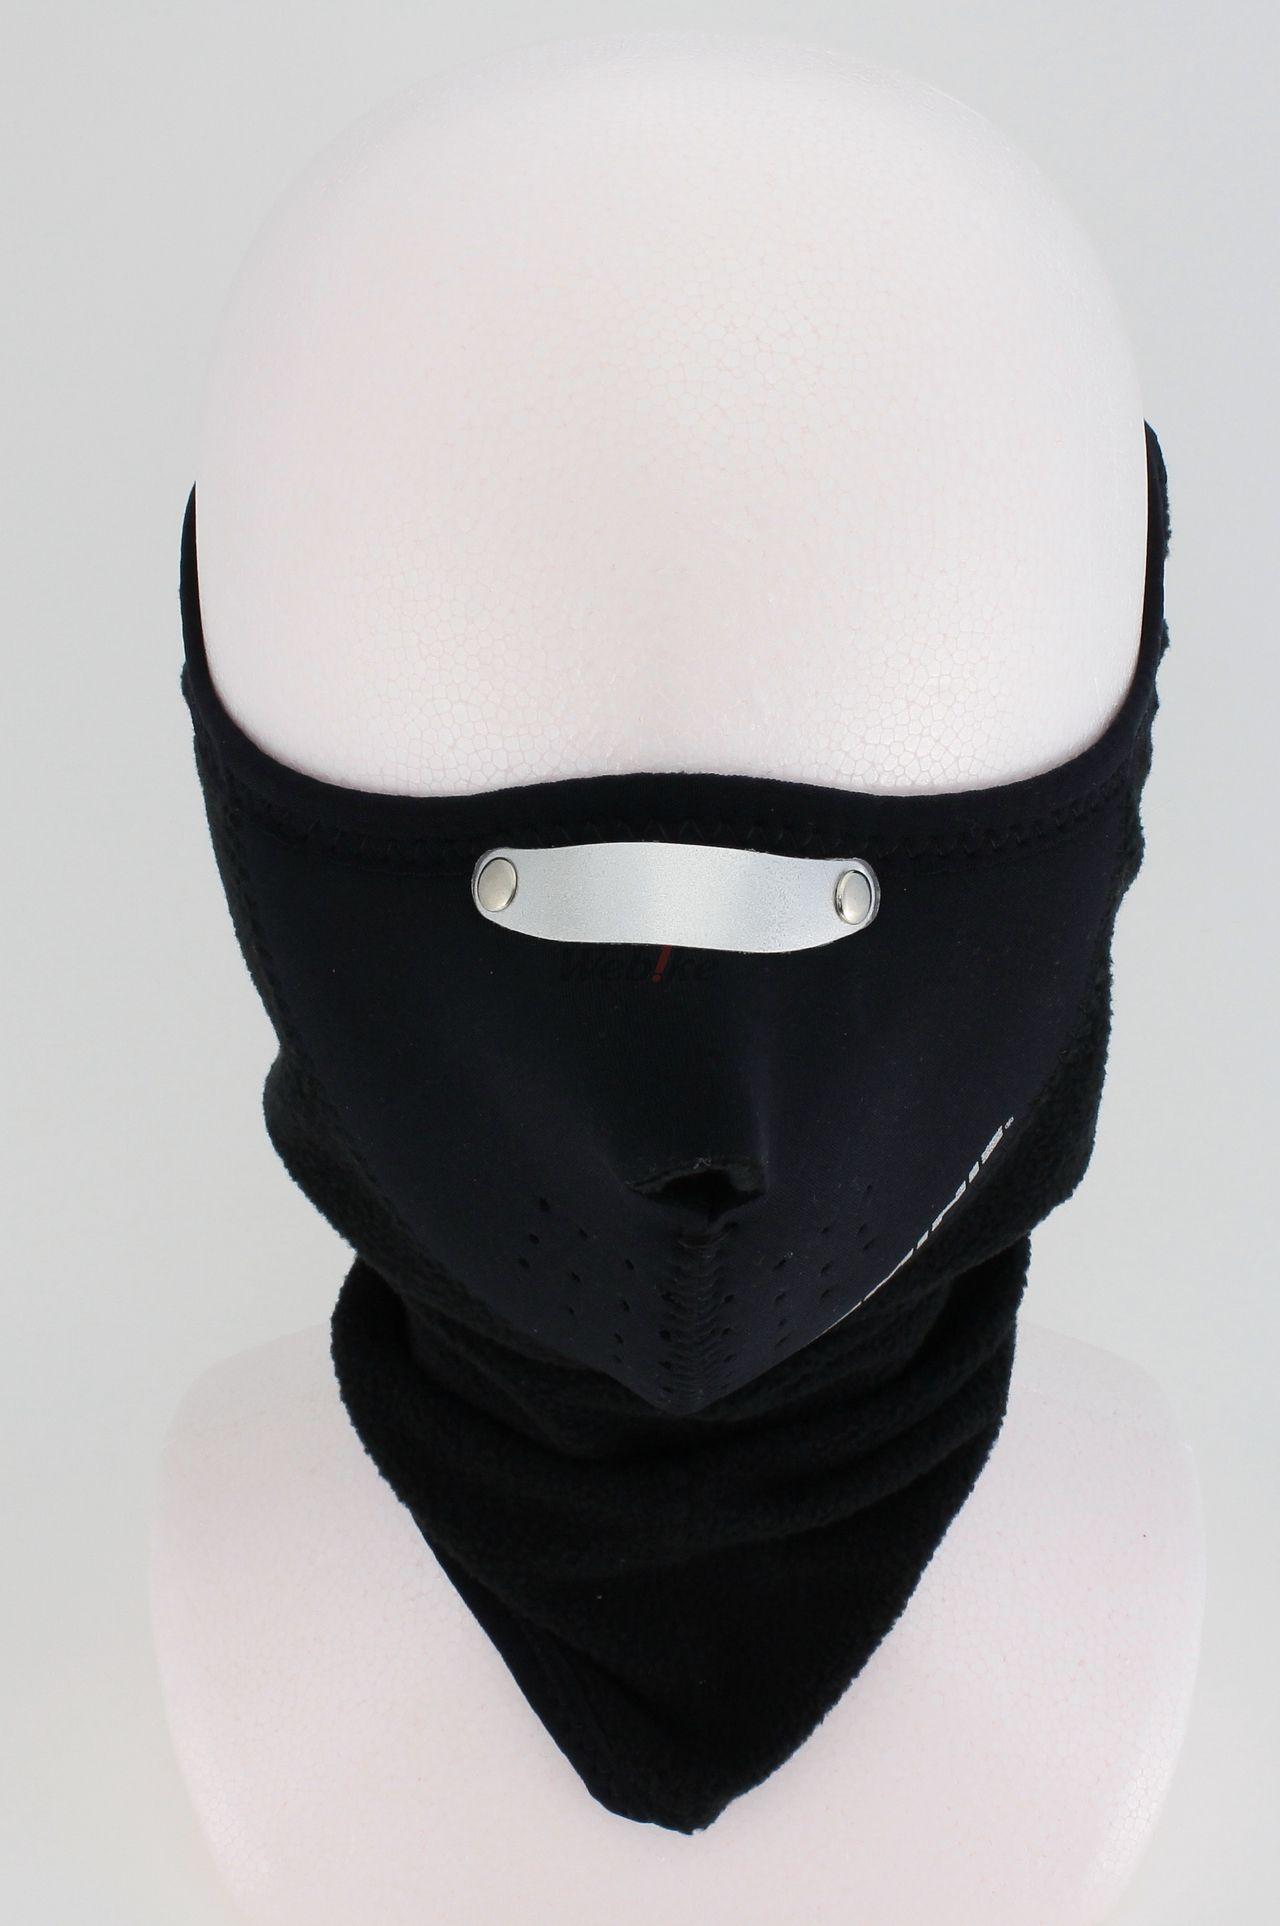 【KOMINE】AK-071 氯丁橡膠保暖面罩 - 「Webike-摩托百貨」